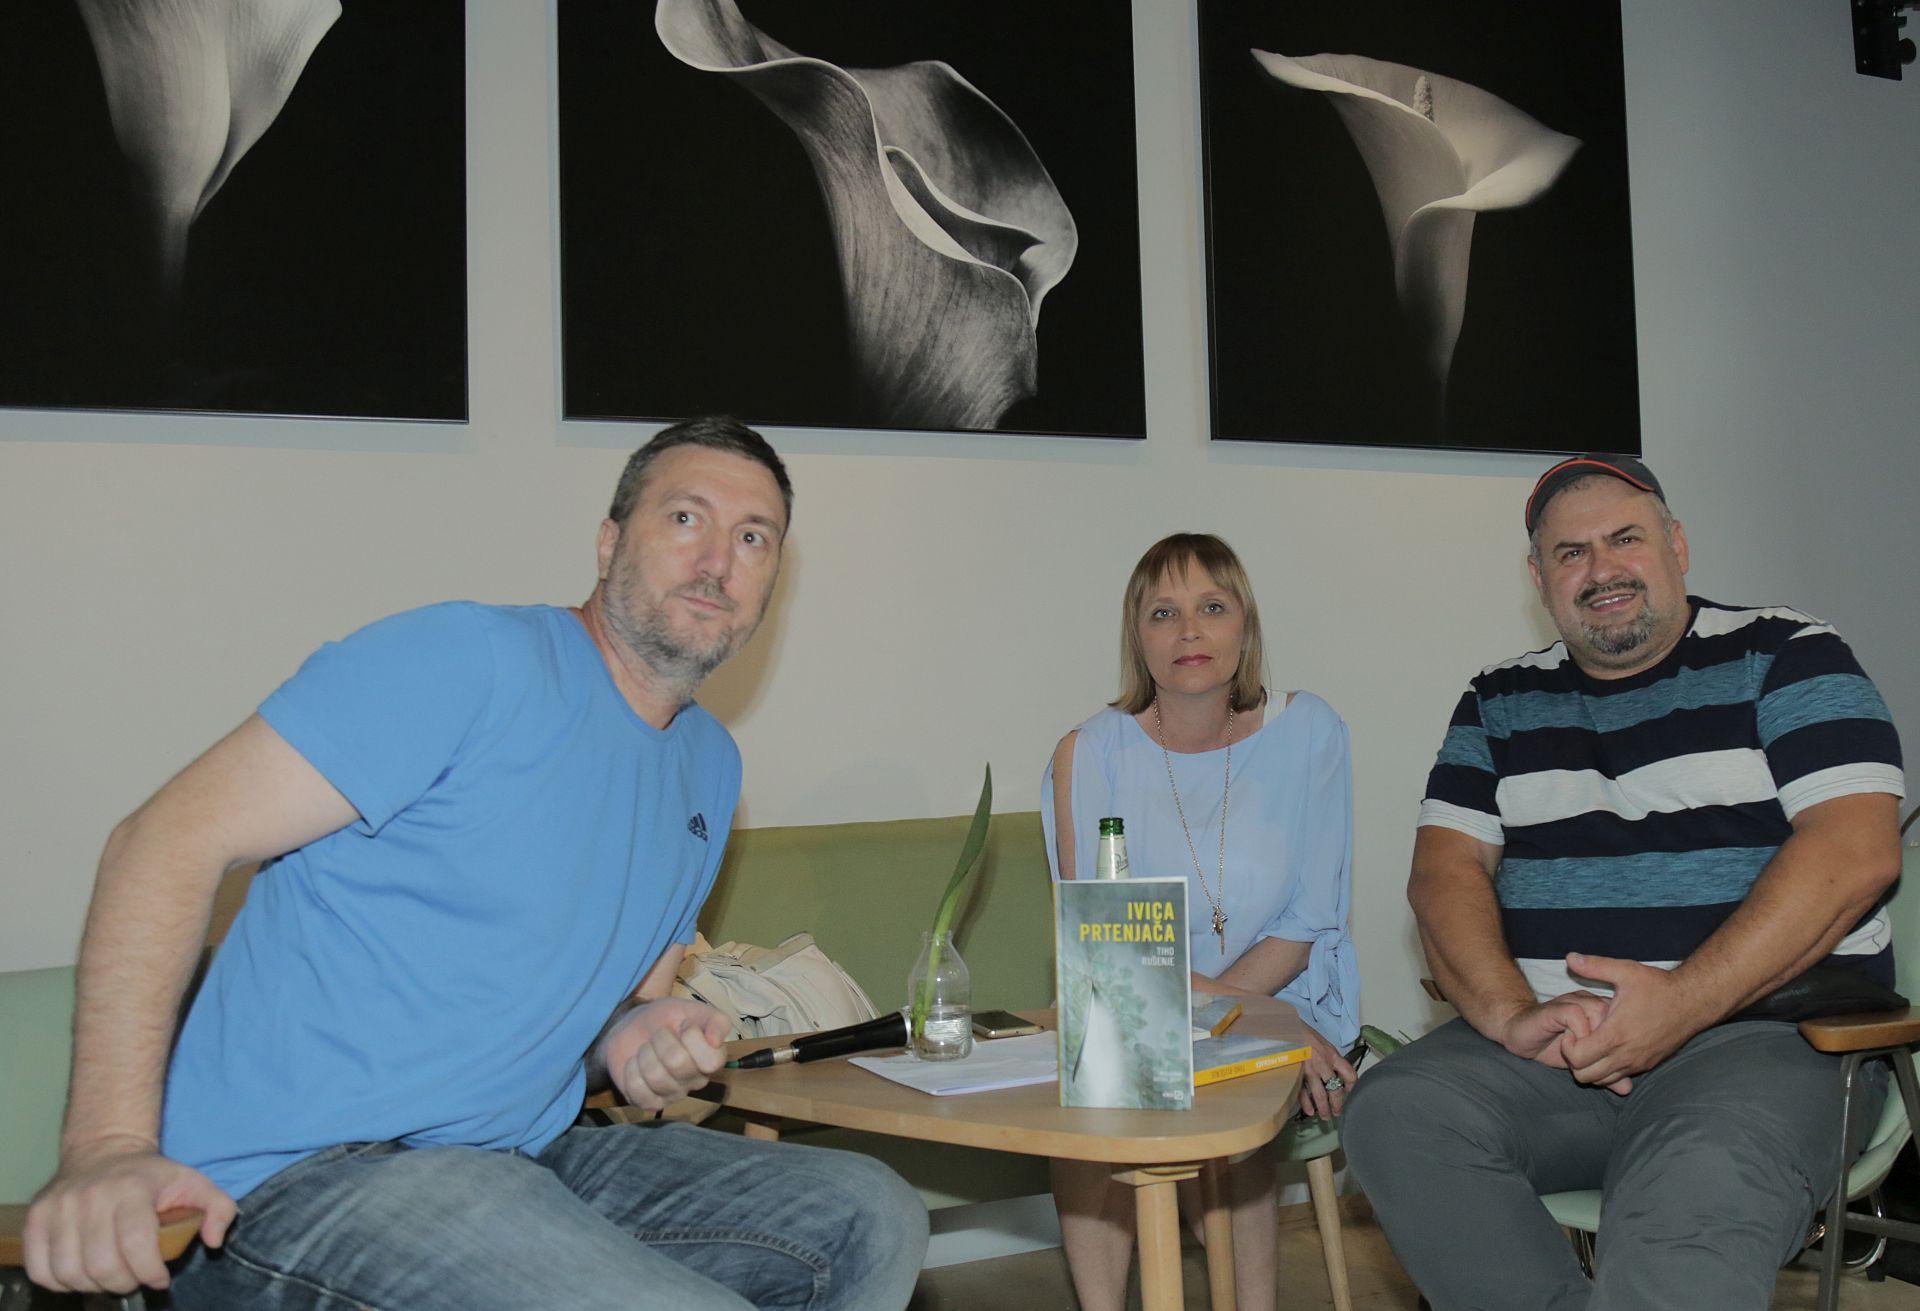 Ivica Prtenjača predstavio novi roman 'Tiho rušenje'